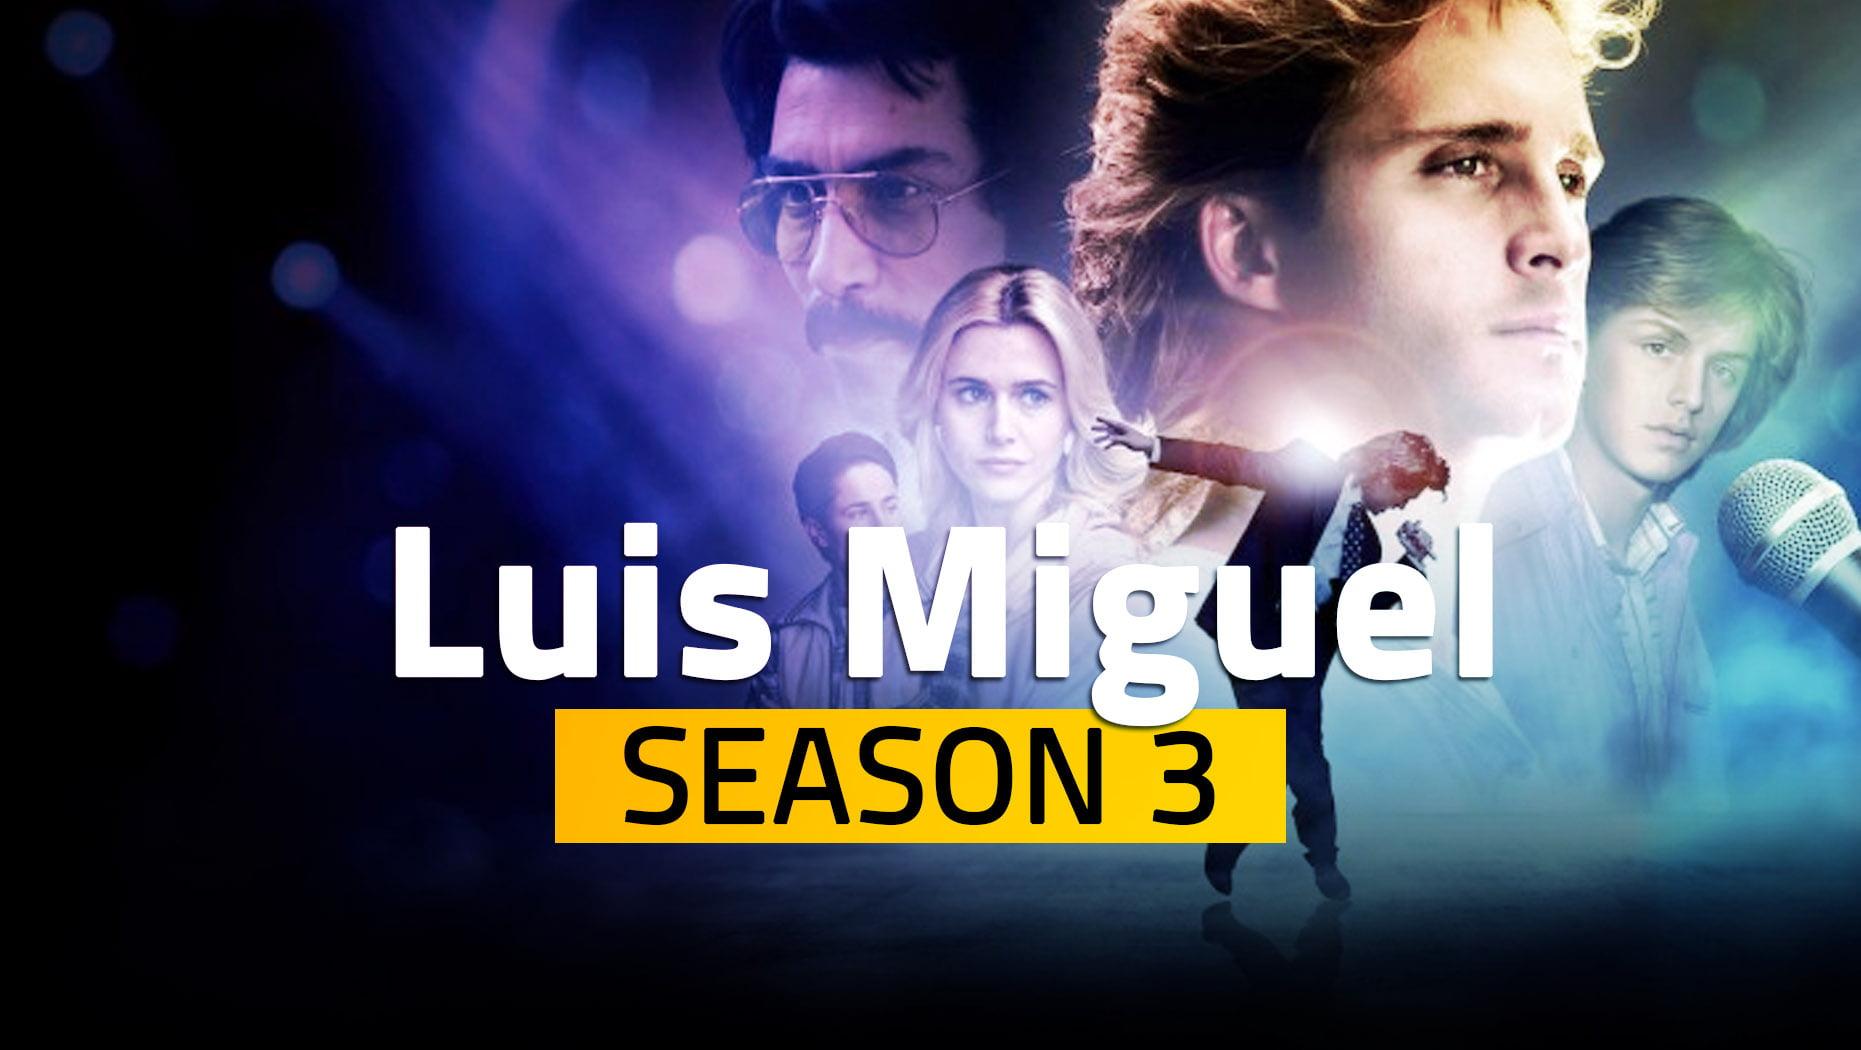 Luis Miguel Season 3 Release Date Spoilers Reddit Watch Online Cast Crew Story Plot & Promo